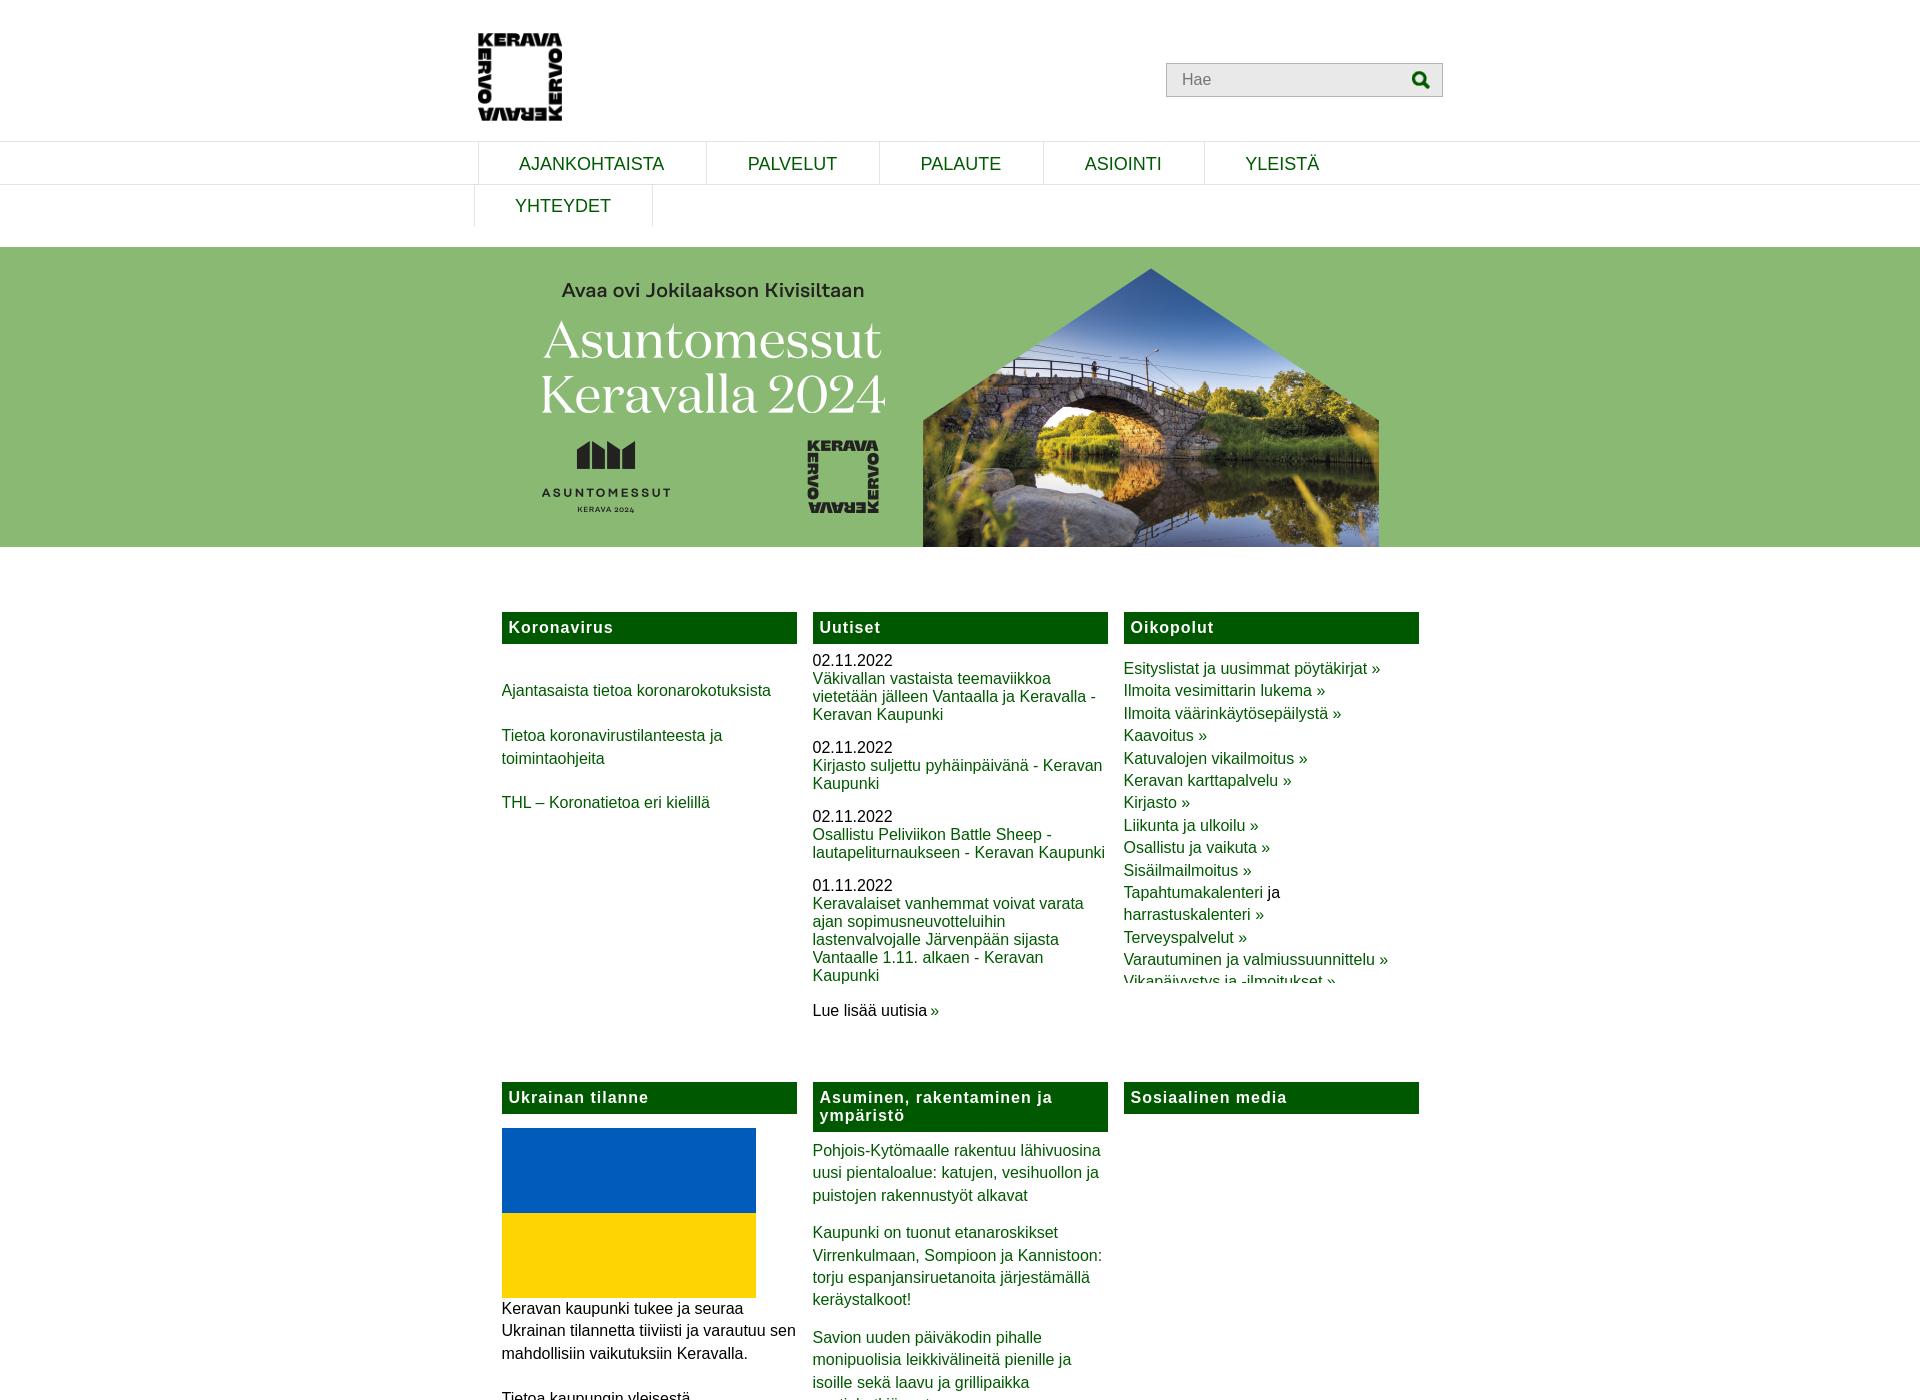 Screenshot for kerava.fi